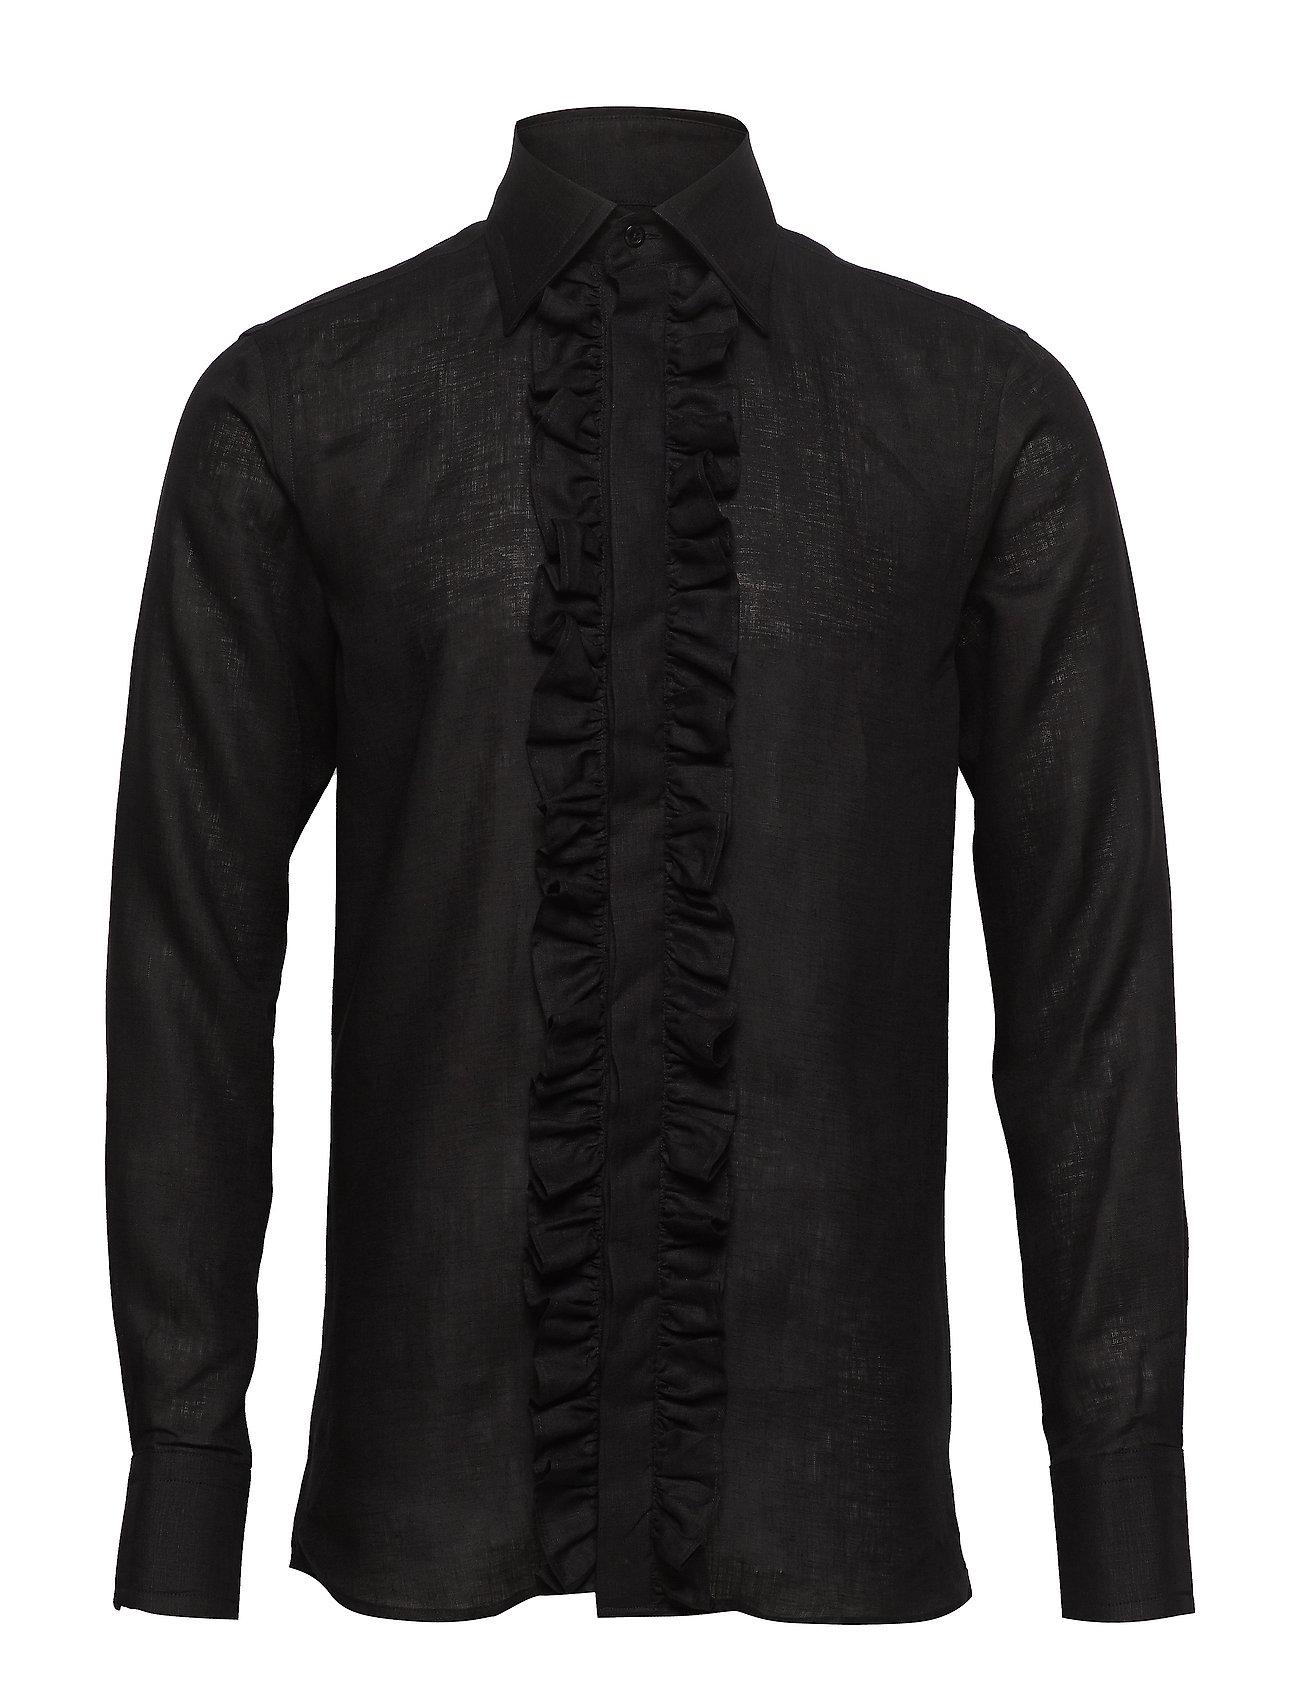 Oscar Jacobson Holme slim shirt - 311 - BLACK